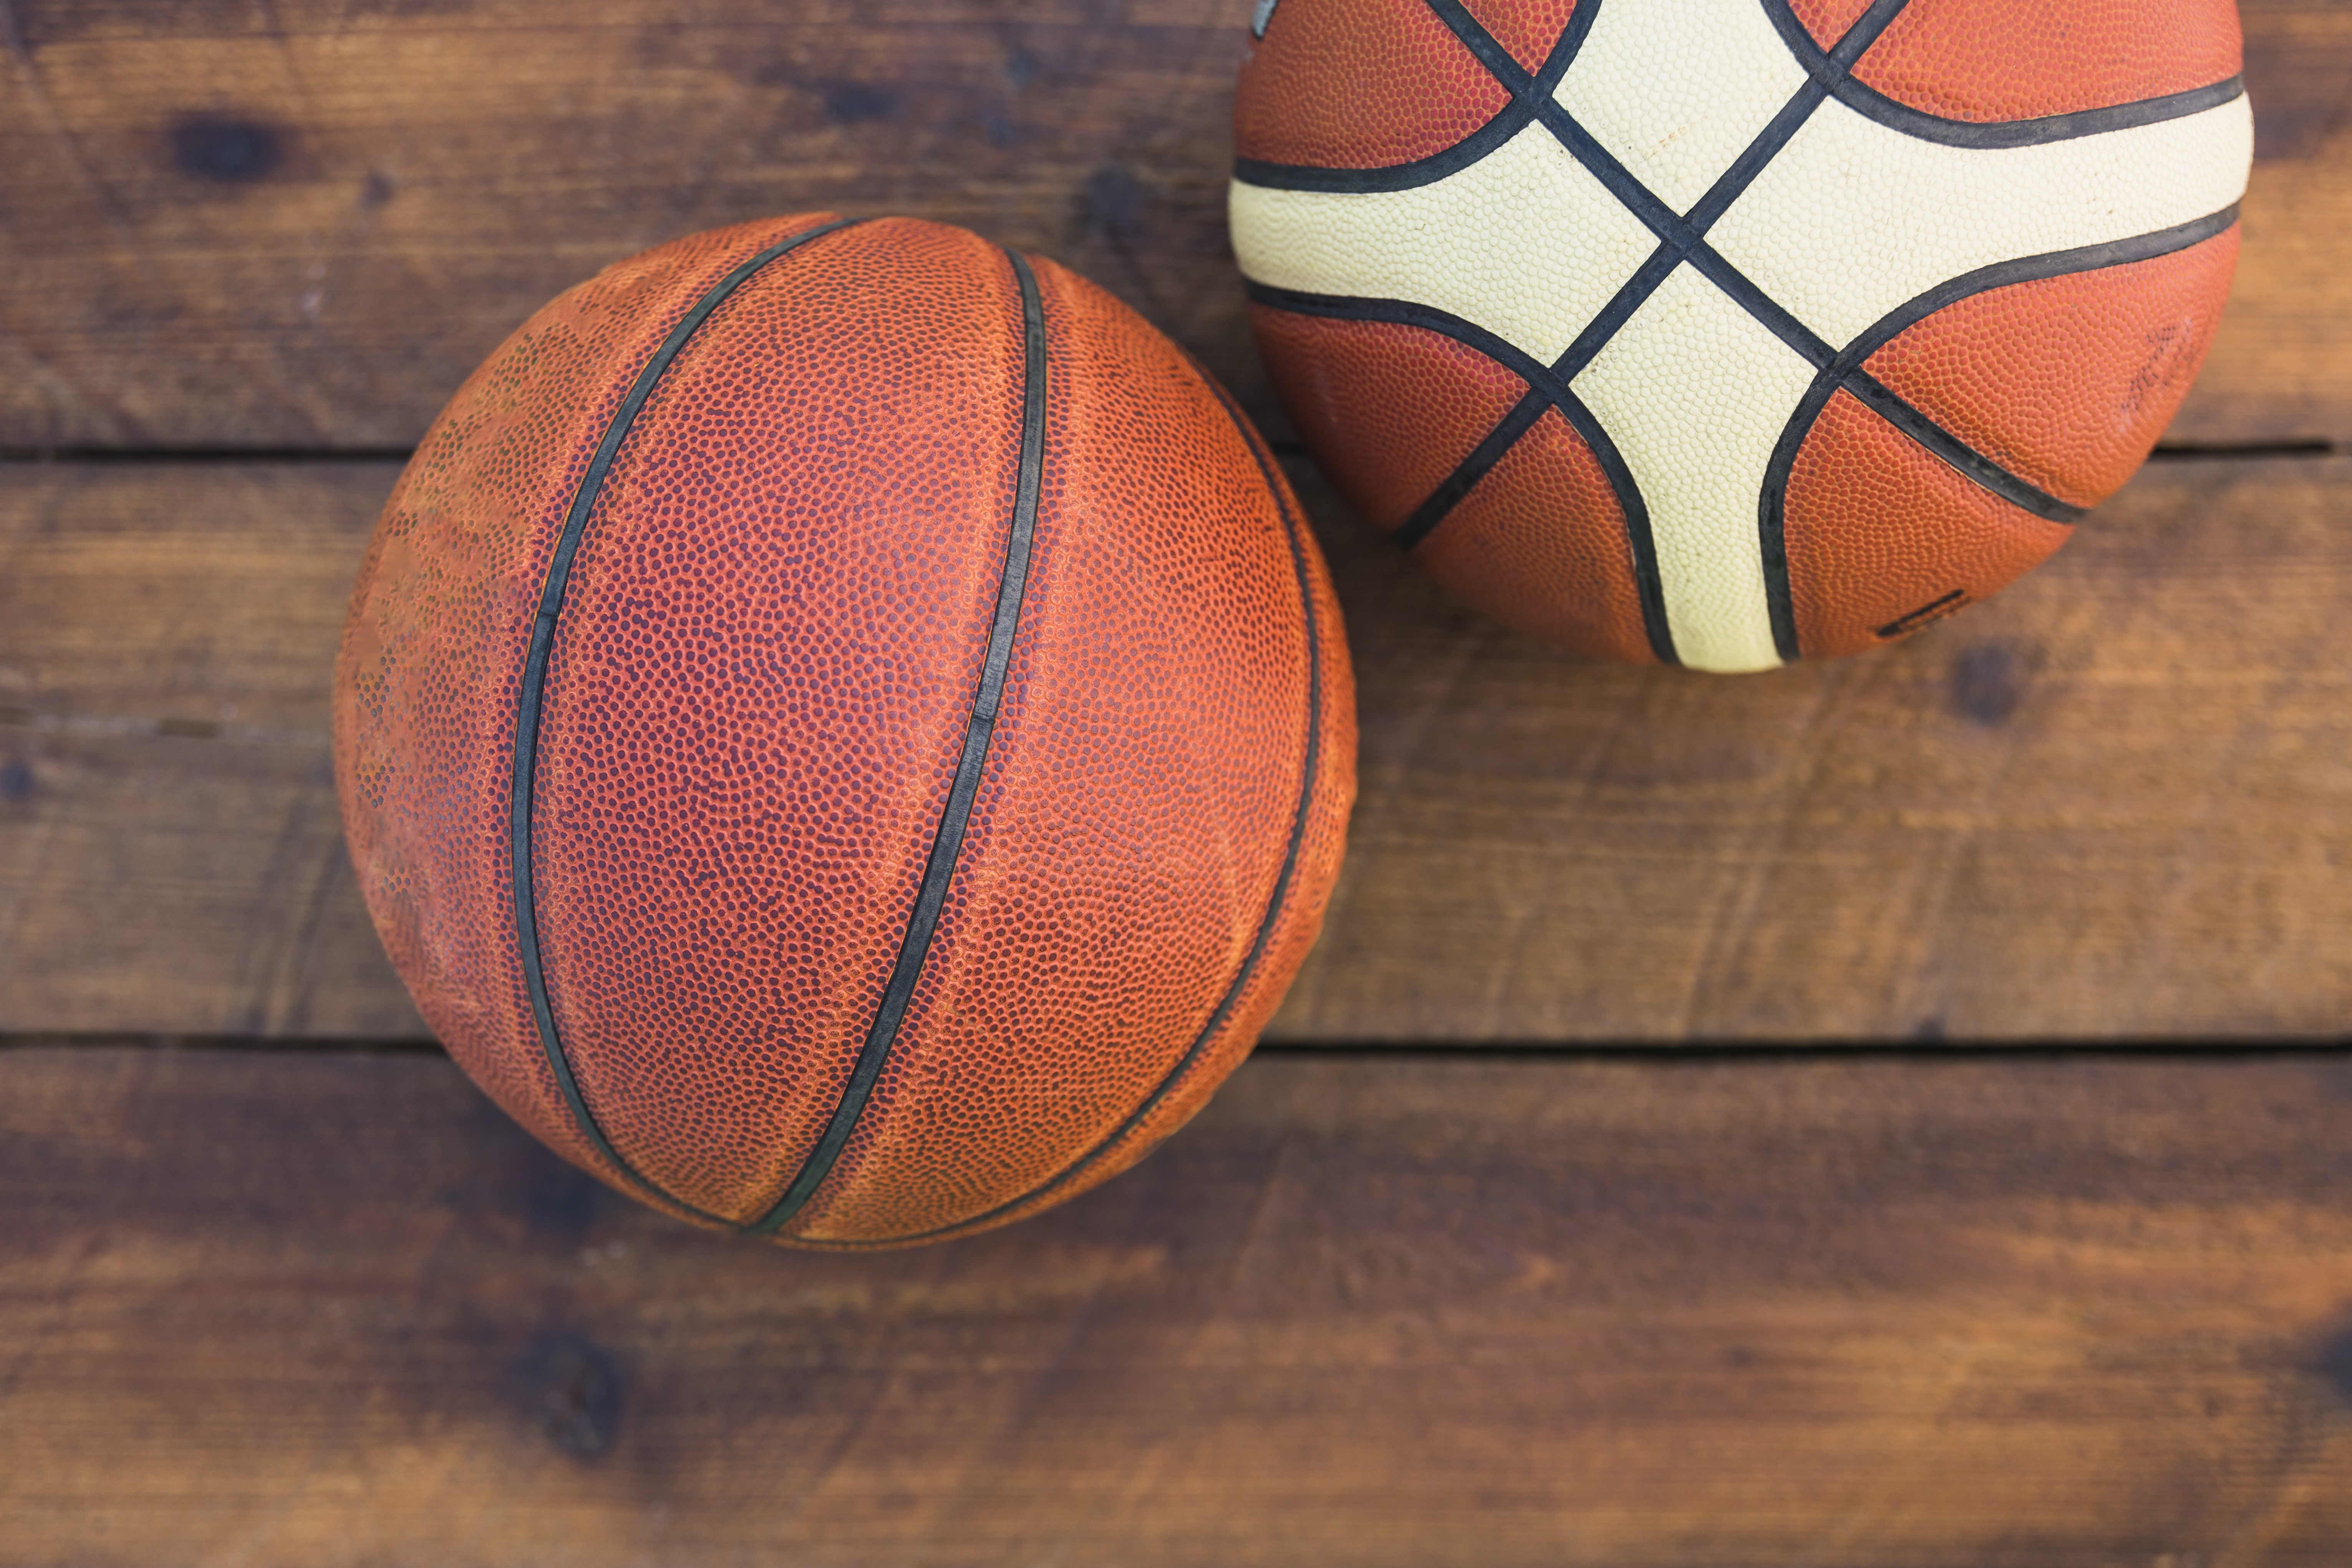 http://www.cestisticalamezia2018.it/wp-content/uploads/2019/01/pallone-basket.jpg